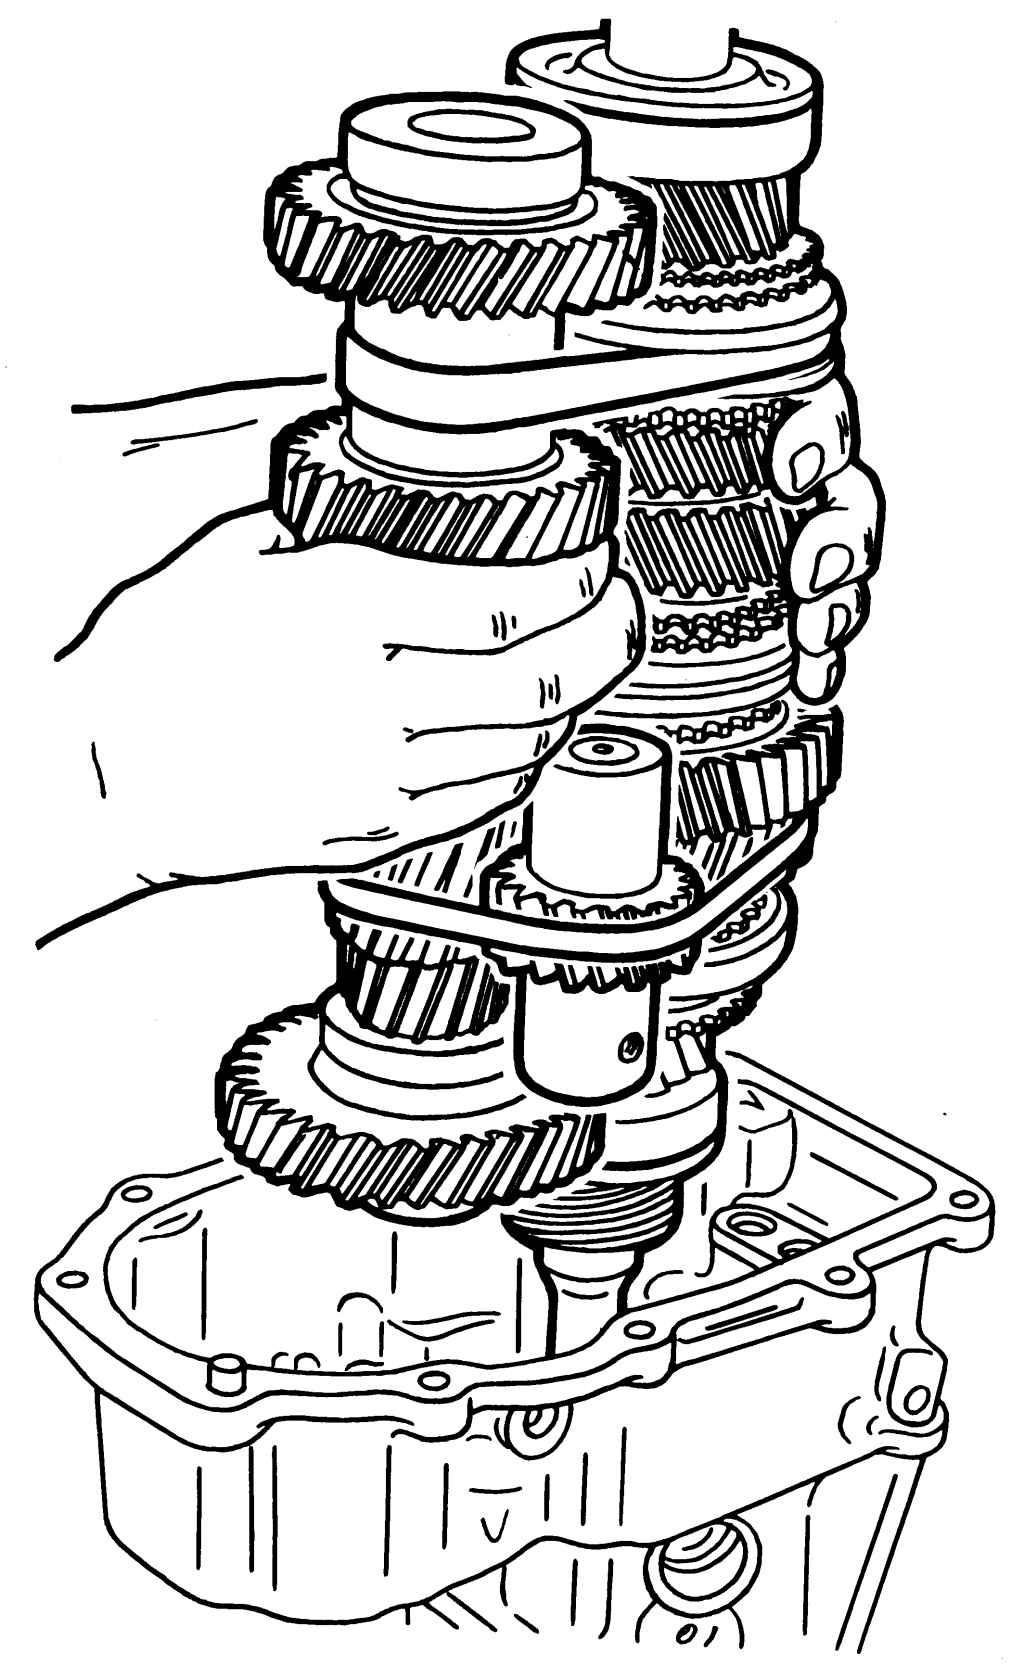 Ремонт коробки газели своими руками